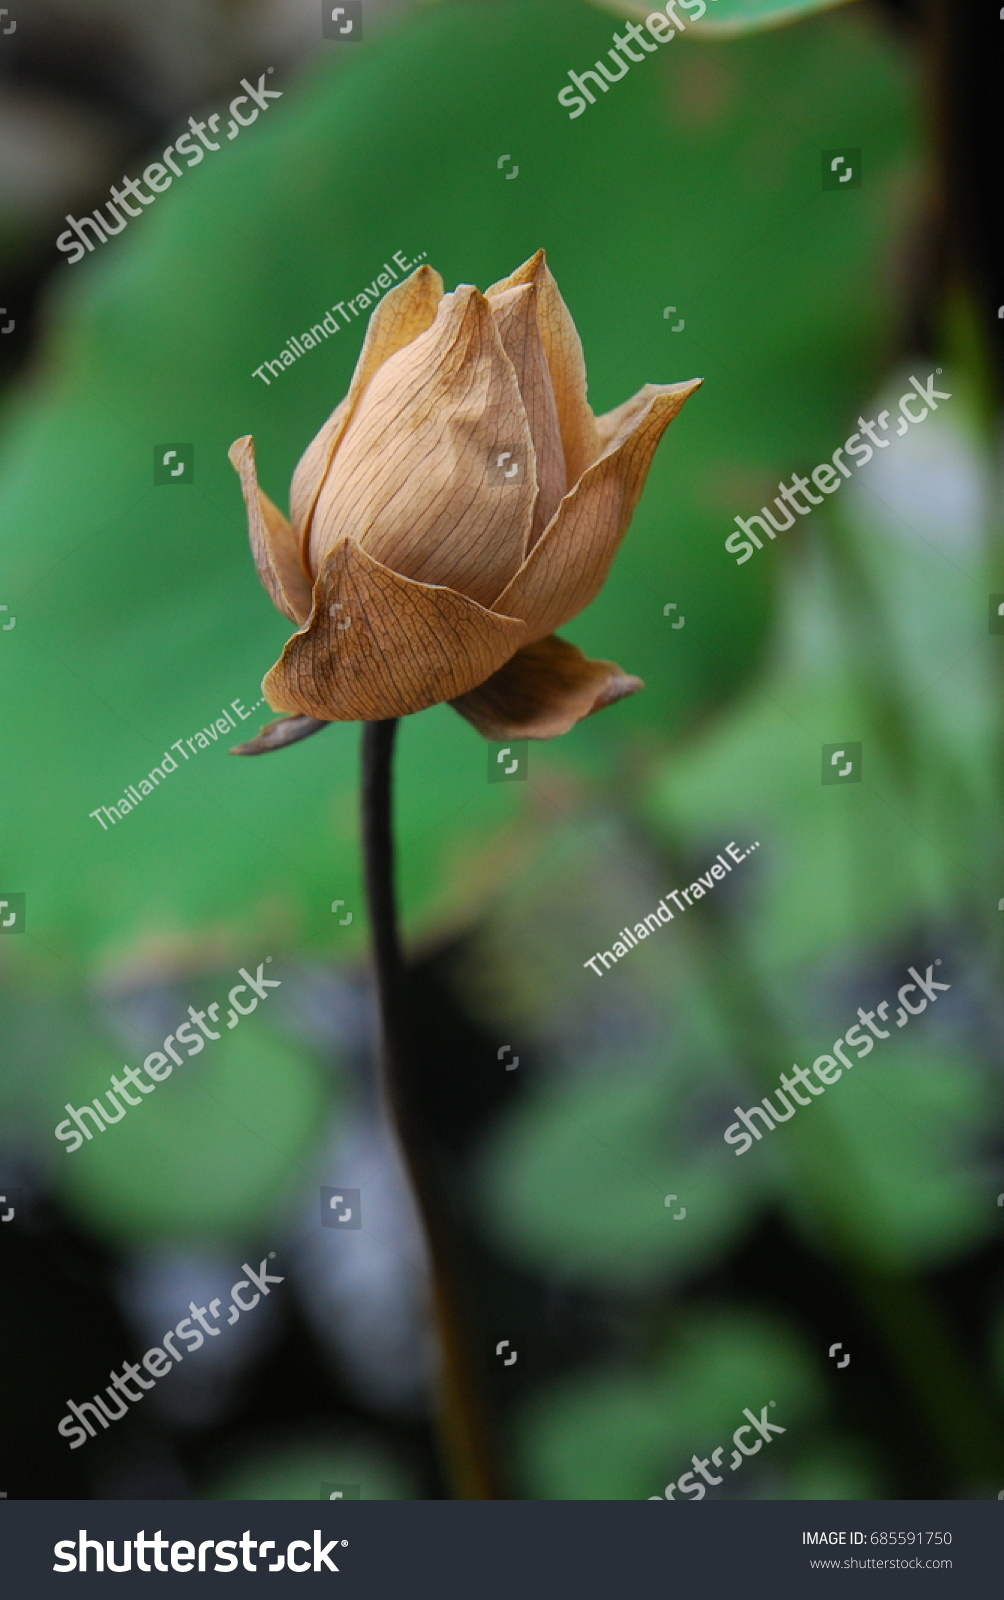 Lotus flower thailand dead still beautiful stock photo edit now lotus flower in thailand dead but still beautiful izmirmasajfo